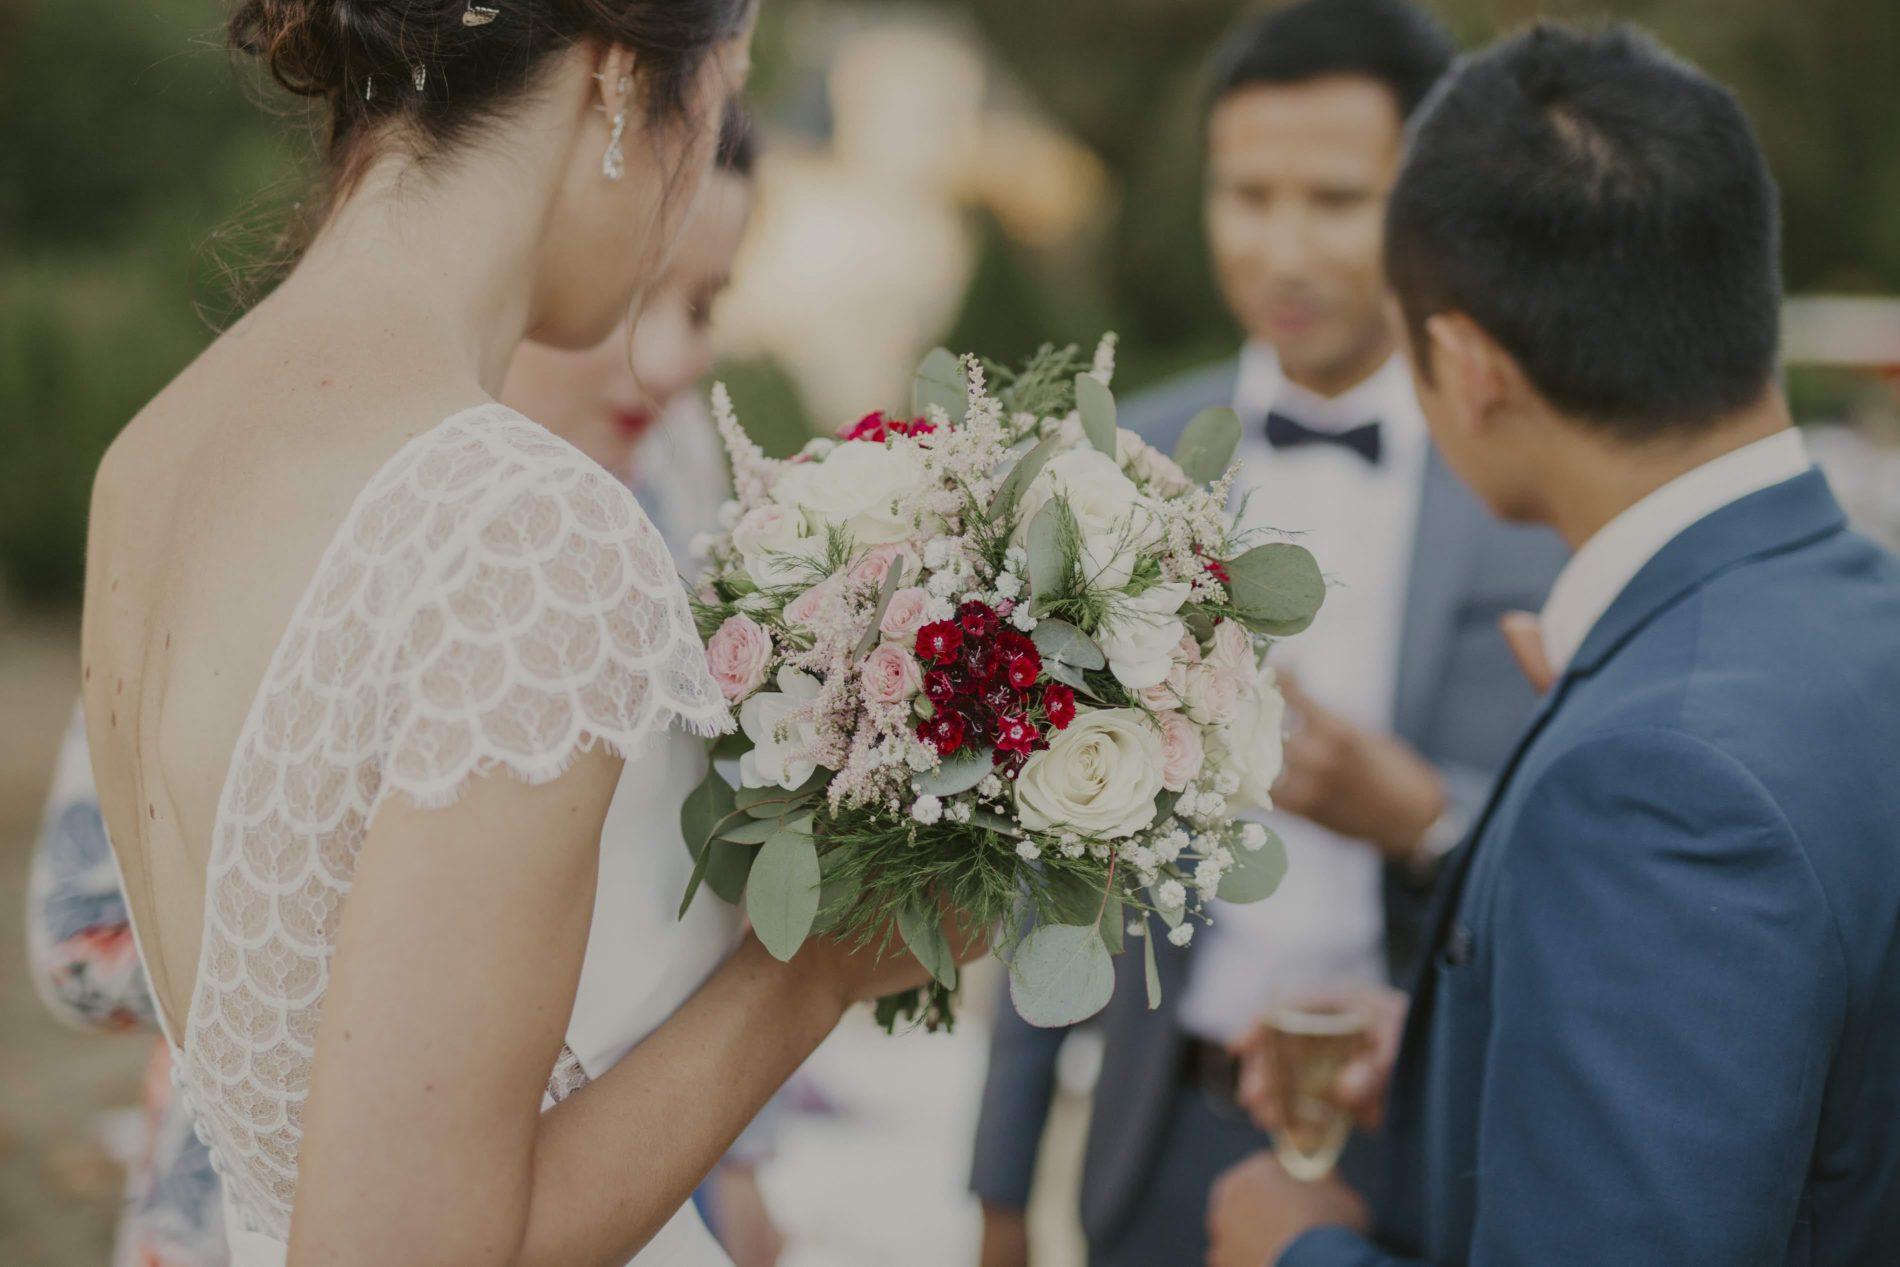 04-CelineSereivuth-125-obonheurdesdames-decoration-mariage-location-Jordane-Chaillou